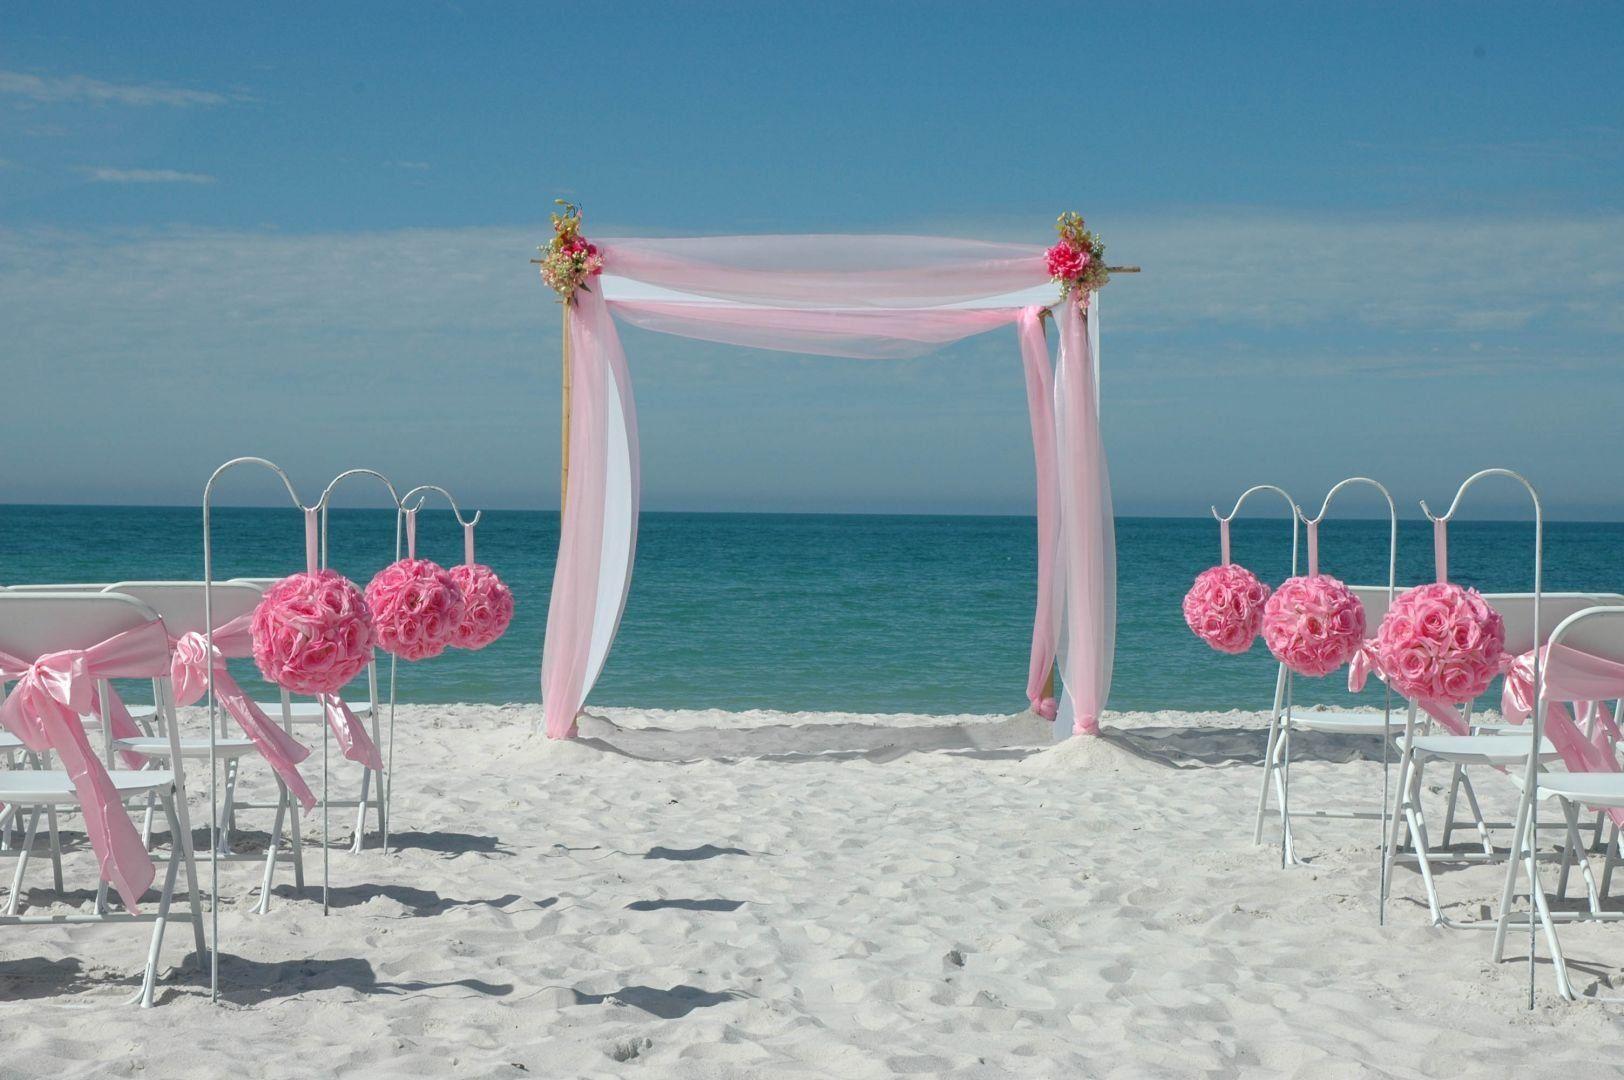 Pink Beach Decor In 2020 Florida Beach Wedding Beach Wedding Pink Beach Wedding Decorations